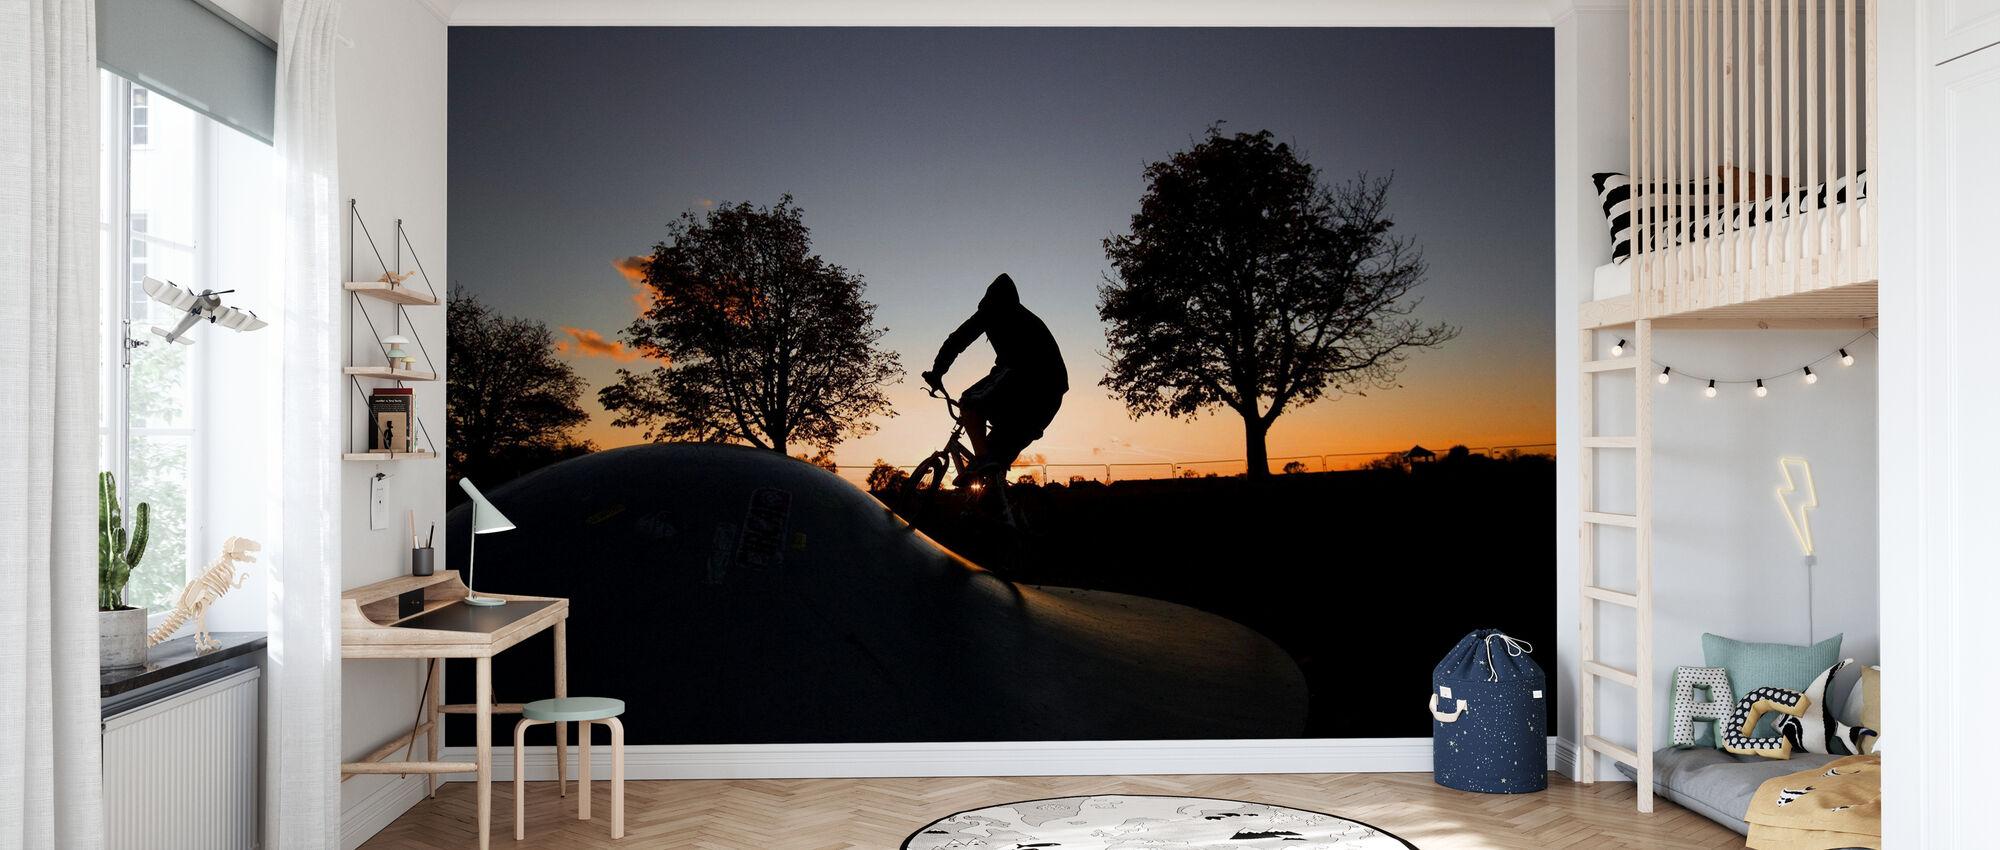 BMX Biking at Sunset - Wallpaper - Kids Room